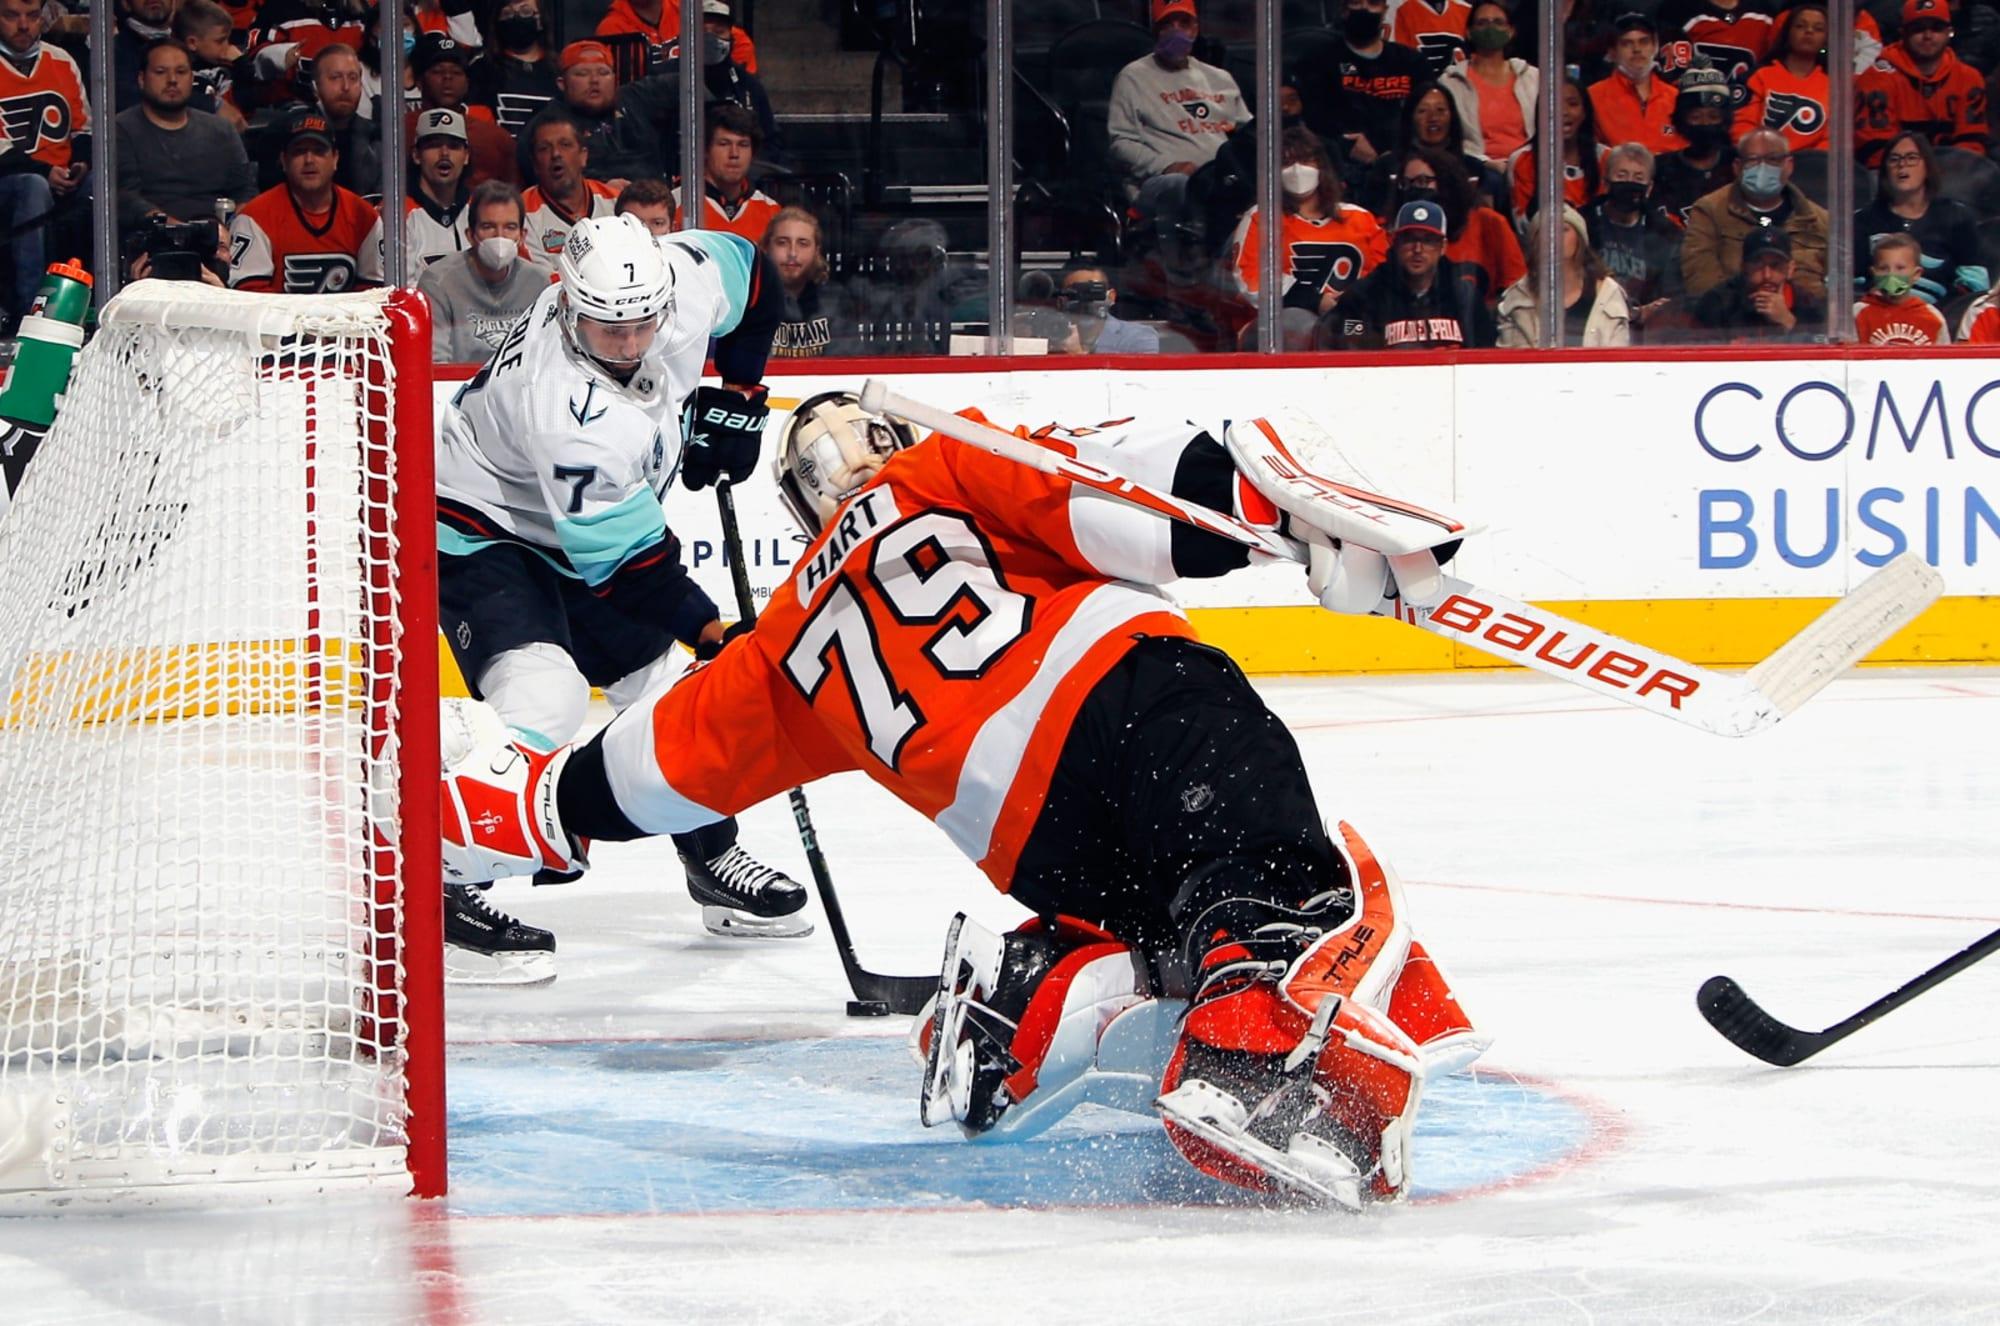 Flyers get first win of the season over Kraken